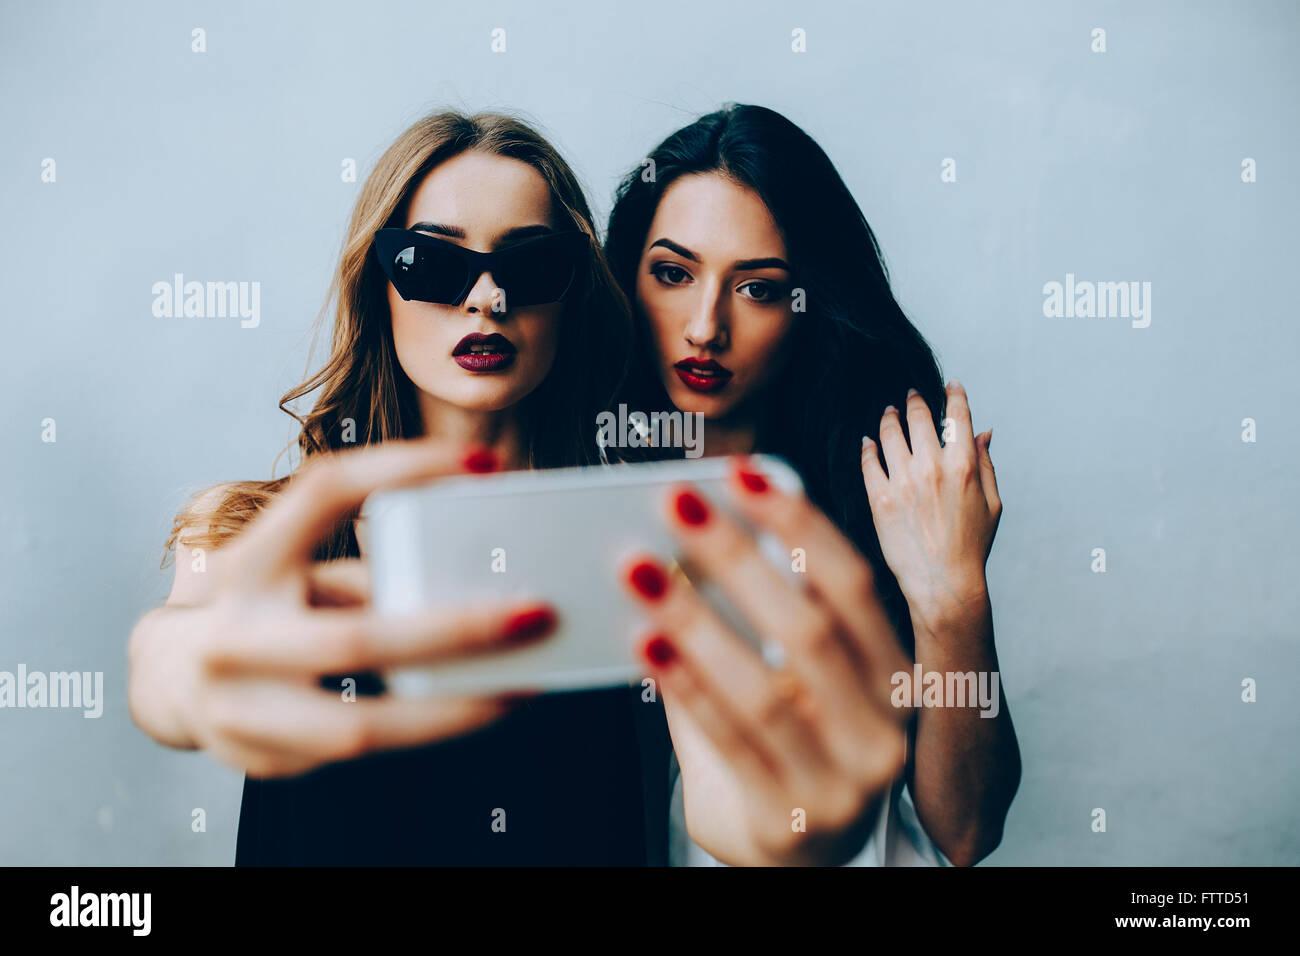 Deux copines en prenant un selfies Photo Stock